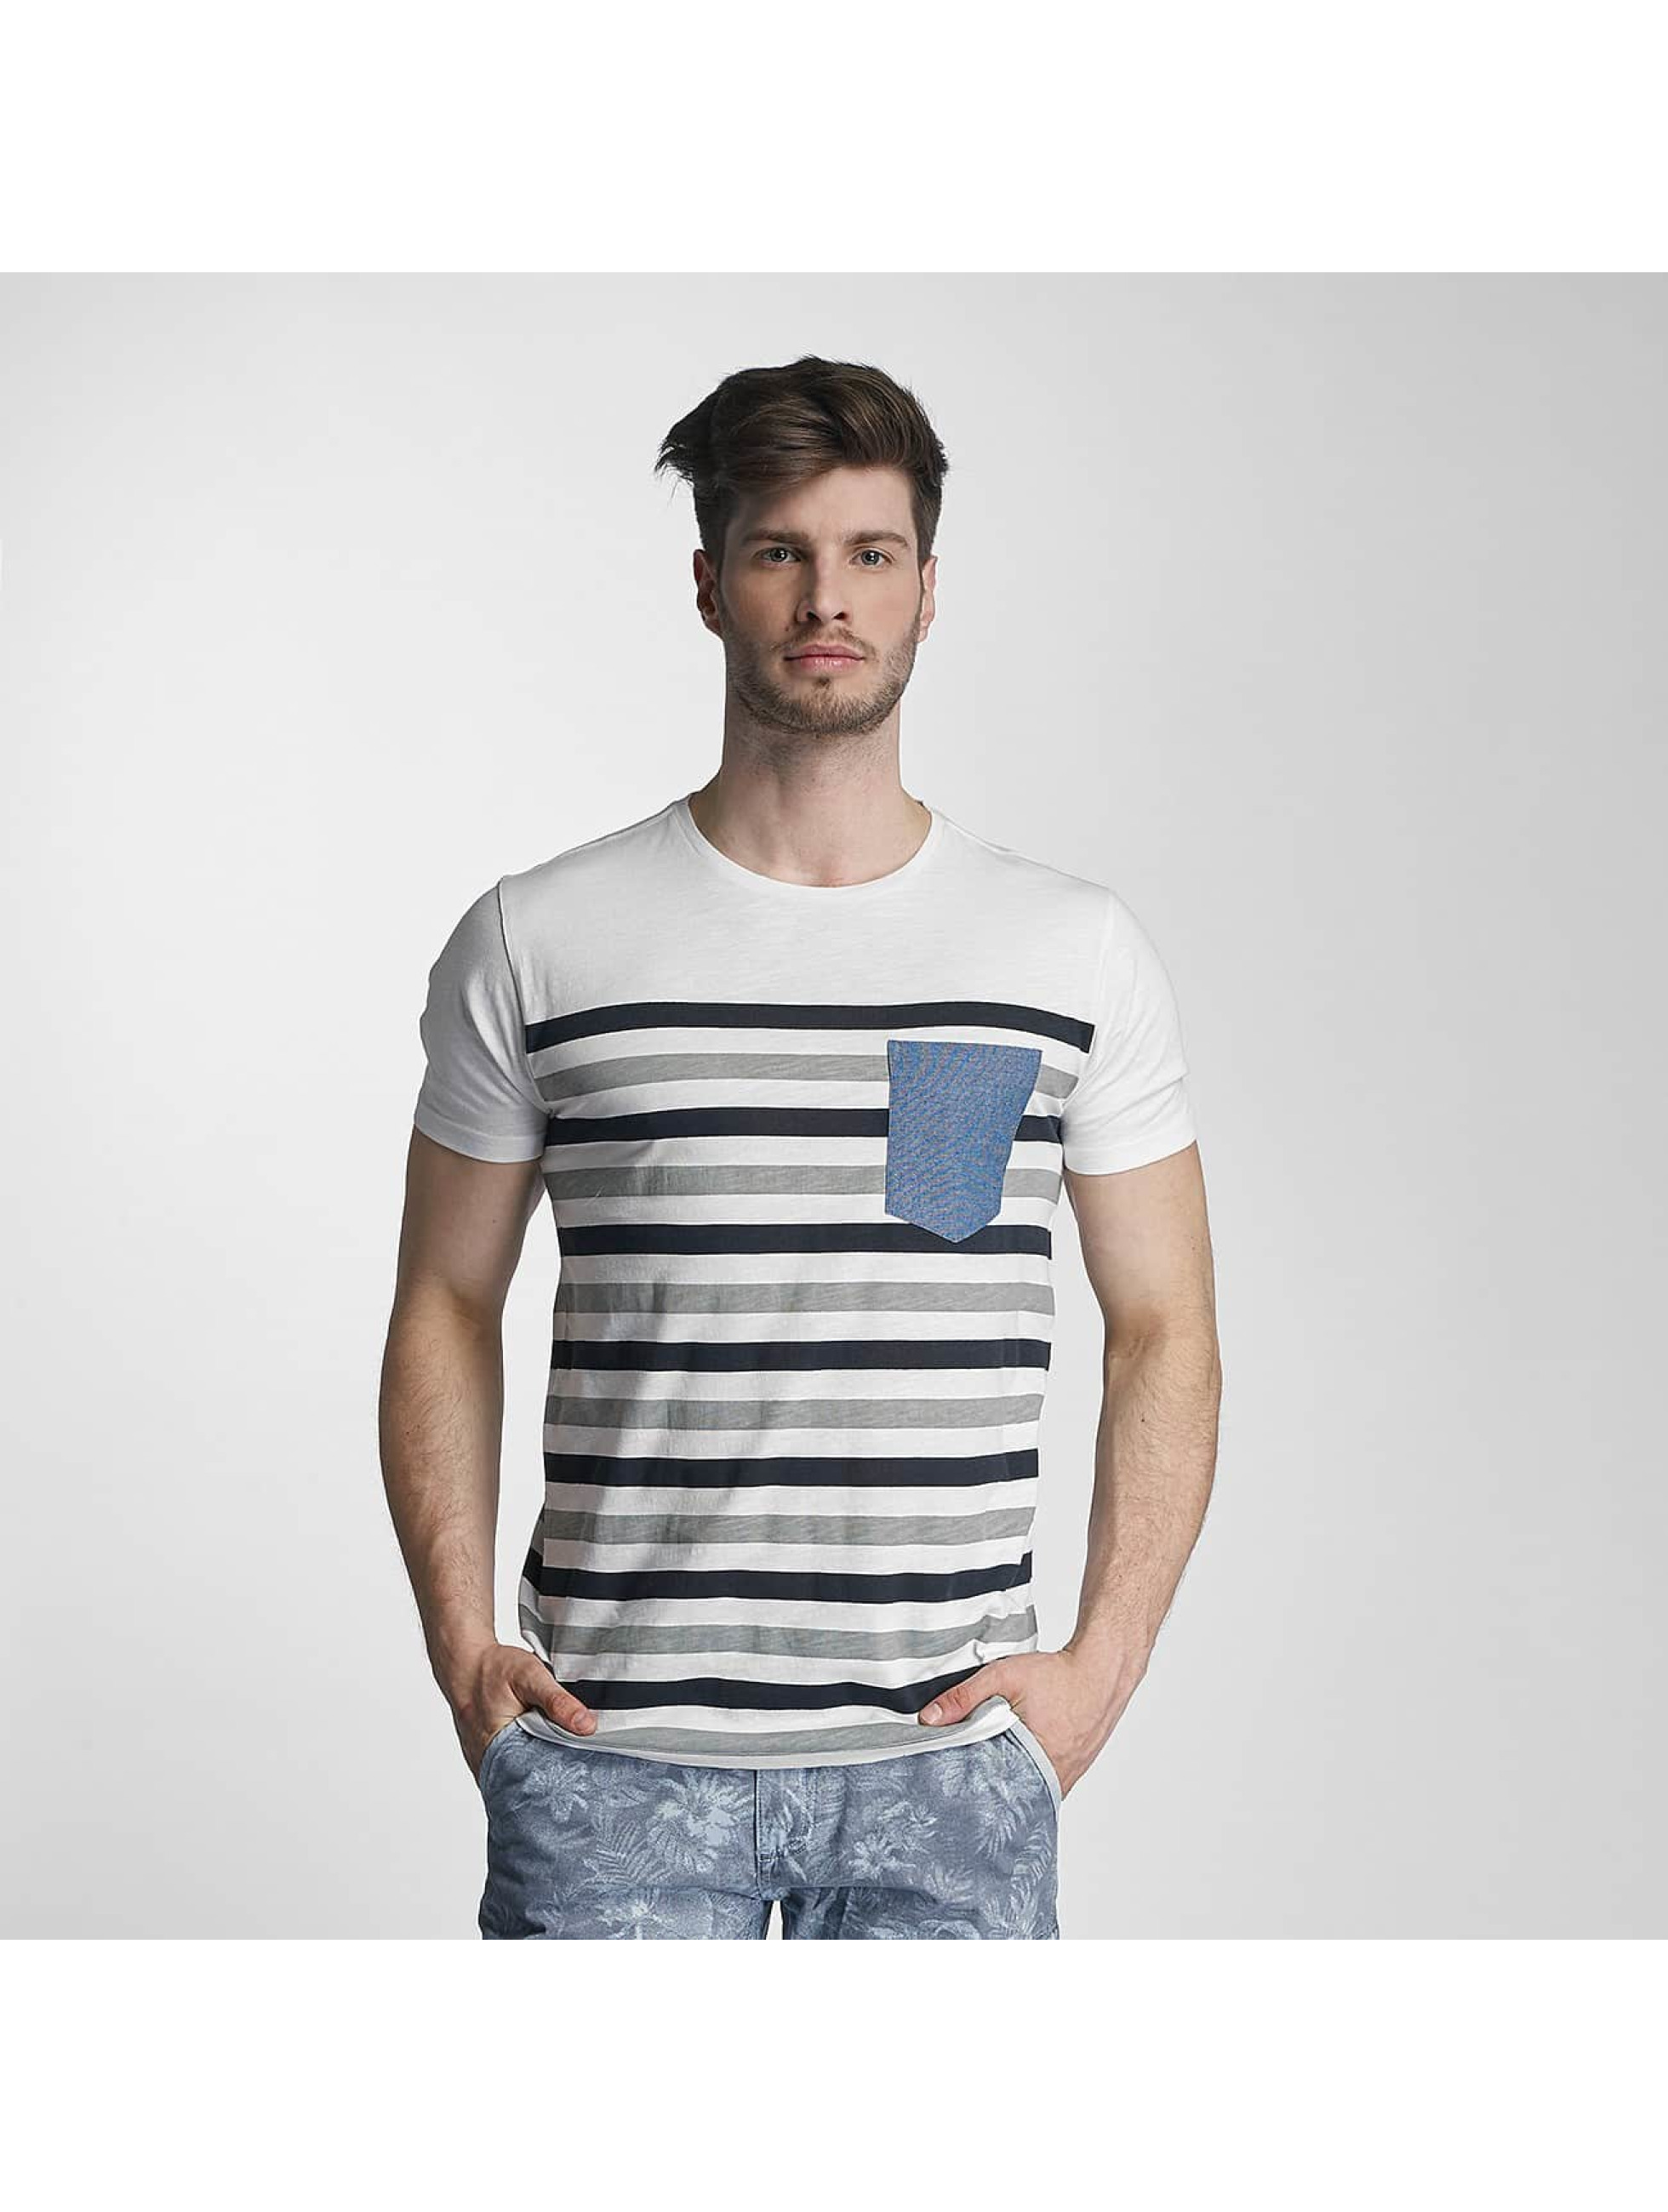 SHINE Original Camiseta Striped gris